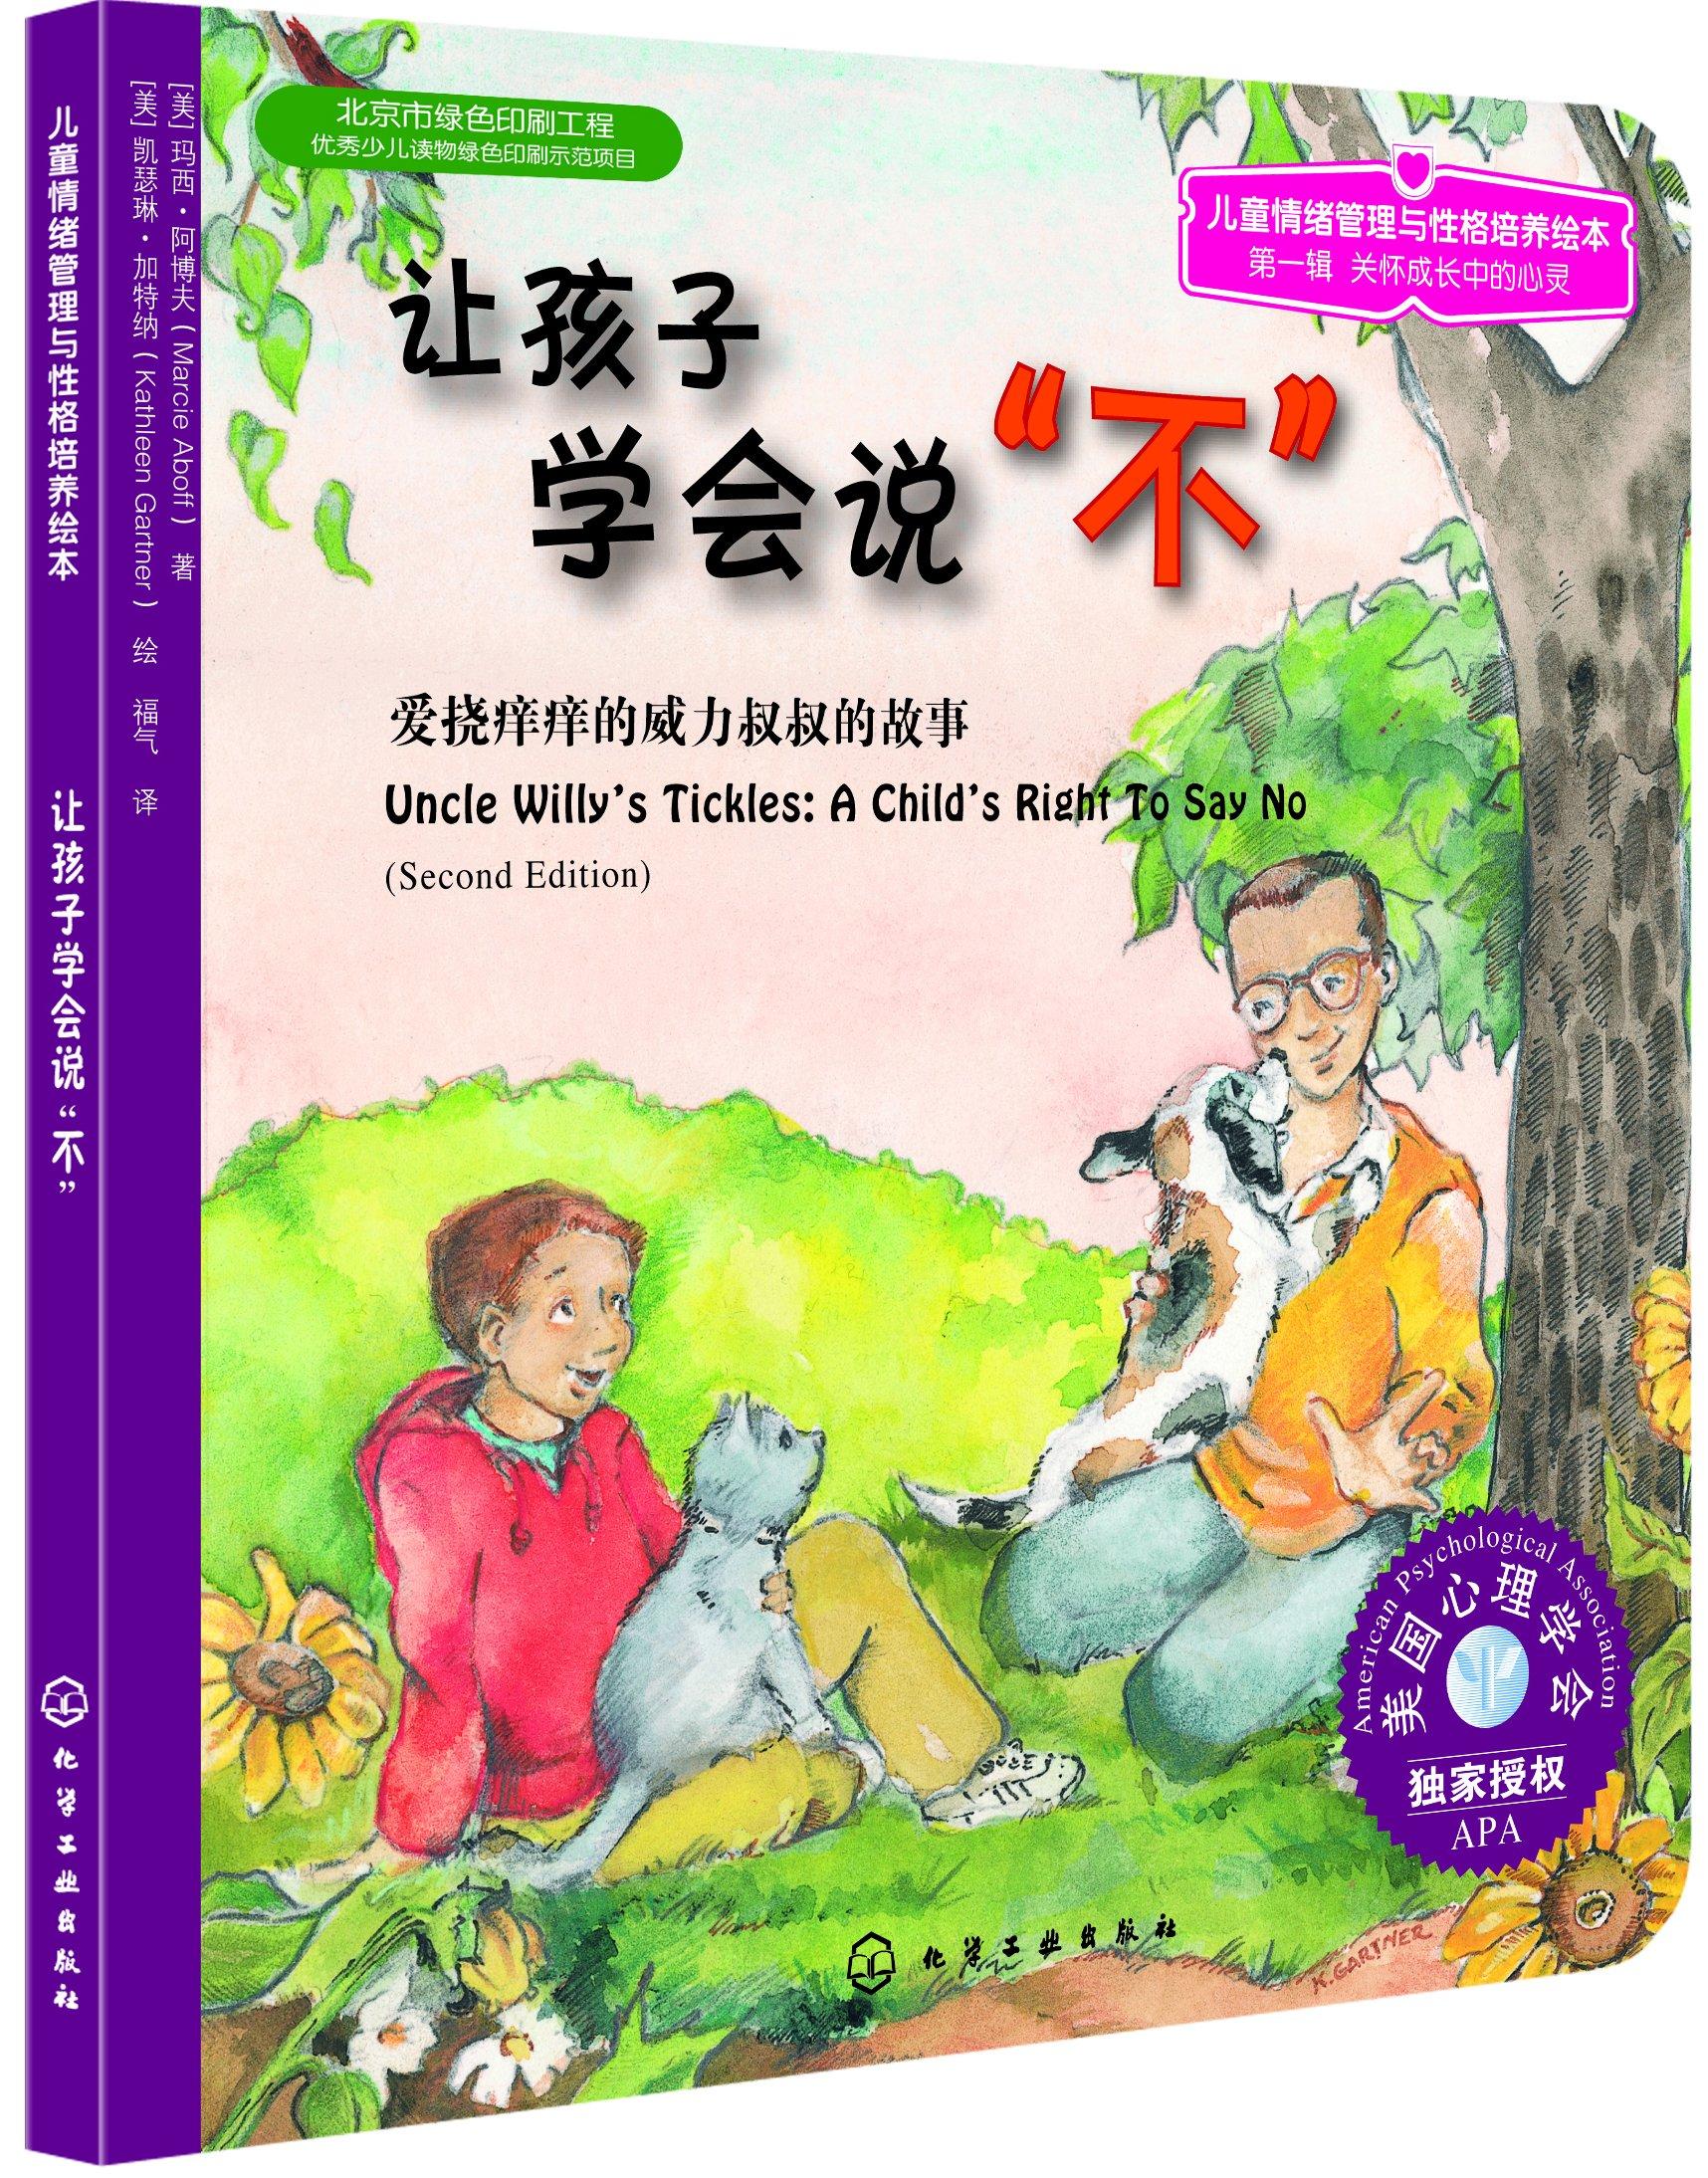 Download 中国太医养生与现代医学研究:三分治七分养医学循证 pdf epub